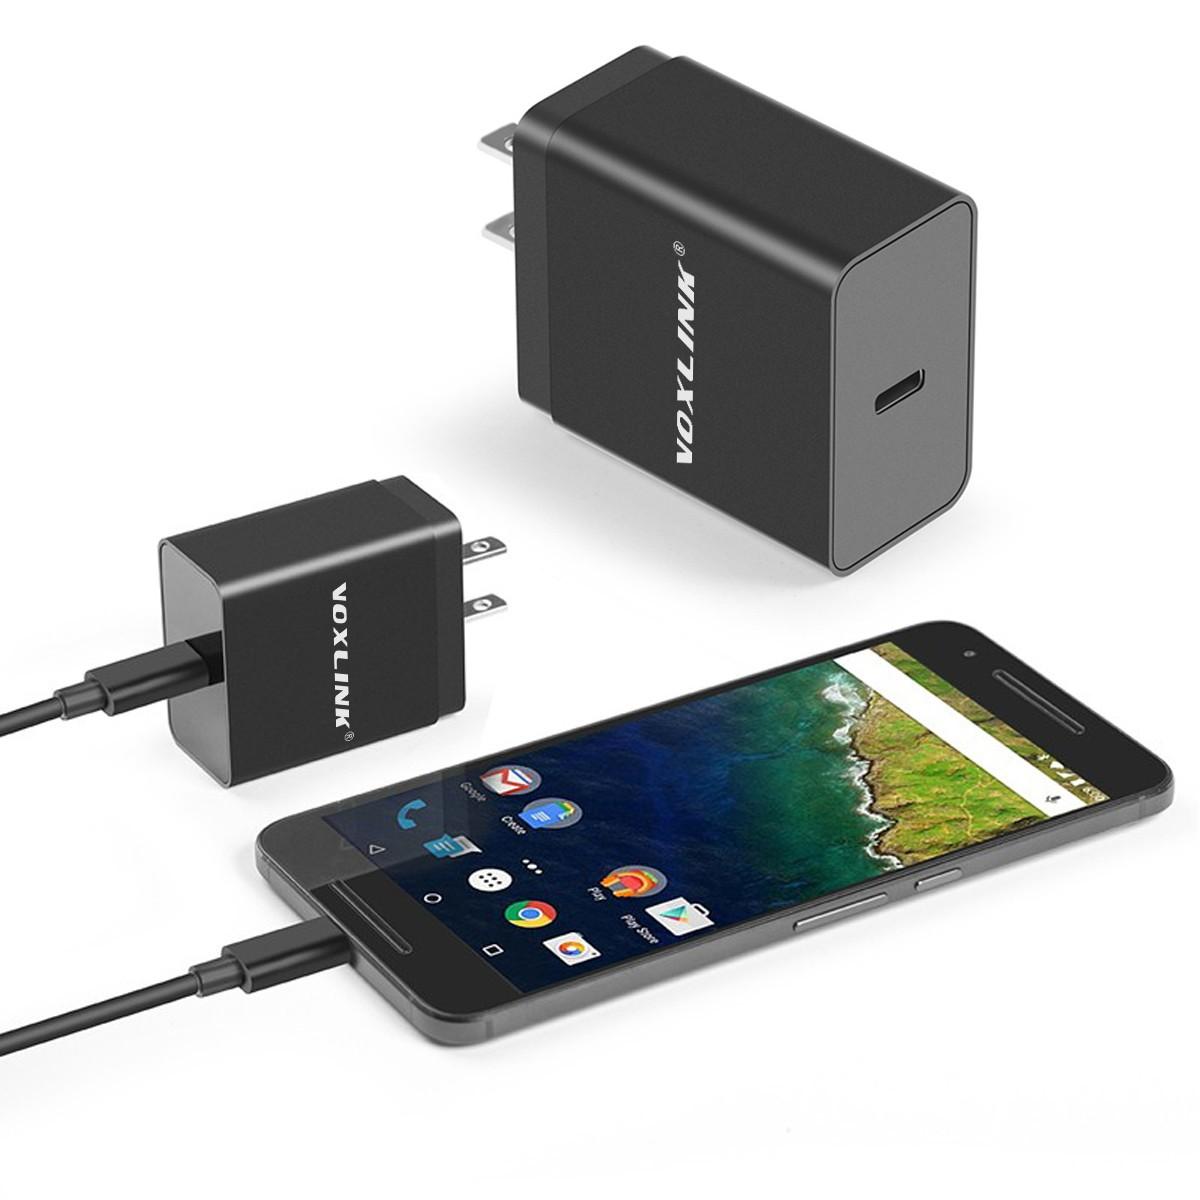 VOXLINK 15 AC adapter pitaniya 3A Wat Webcam zaryadnoye ustroystvo tipa C dlya Huawei Honor 8 P9 plyus V8 Nexus 6 P / Macbook Nokia N1 OnePlus 2 Pust' V Le A EU